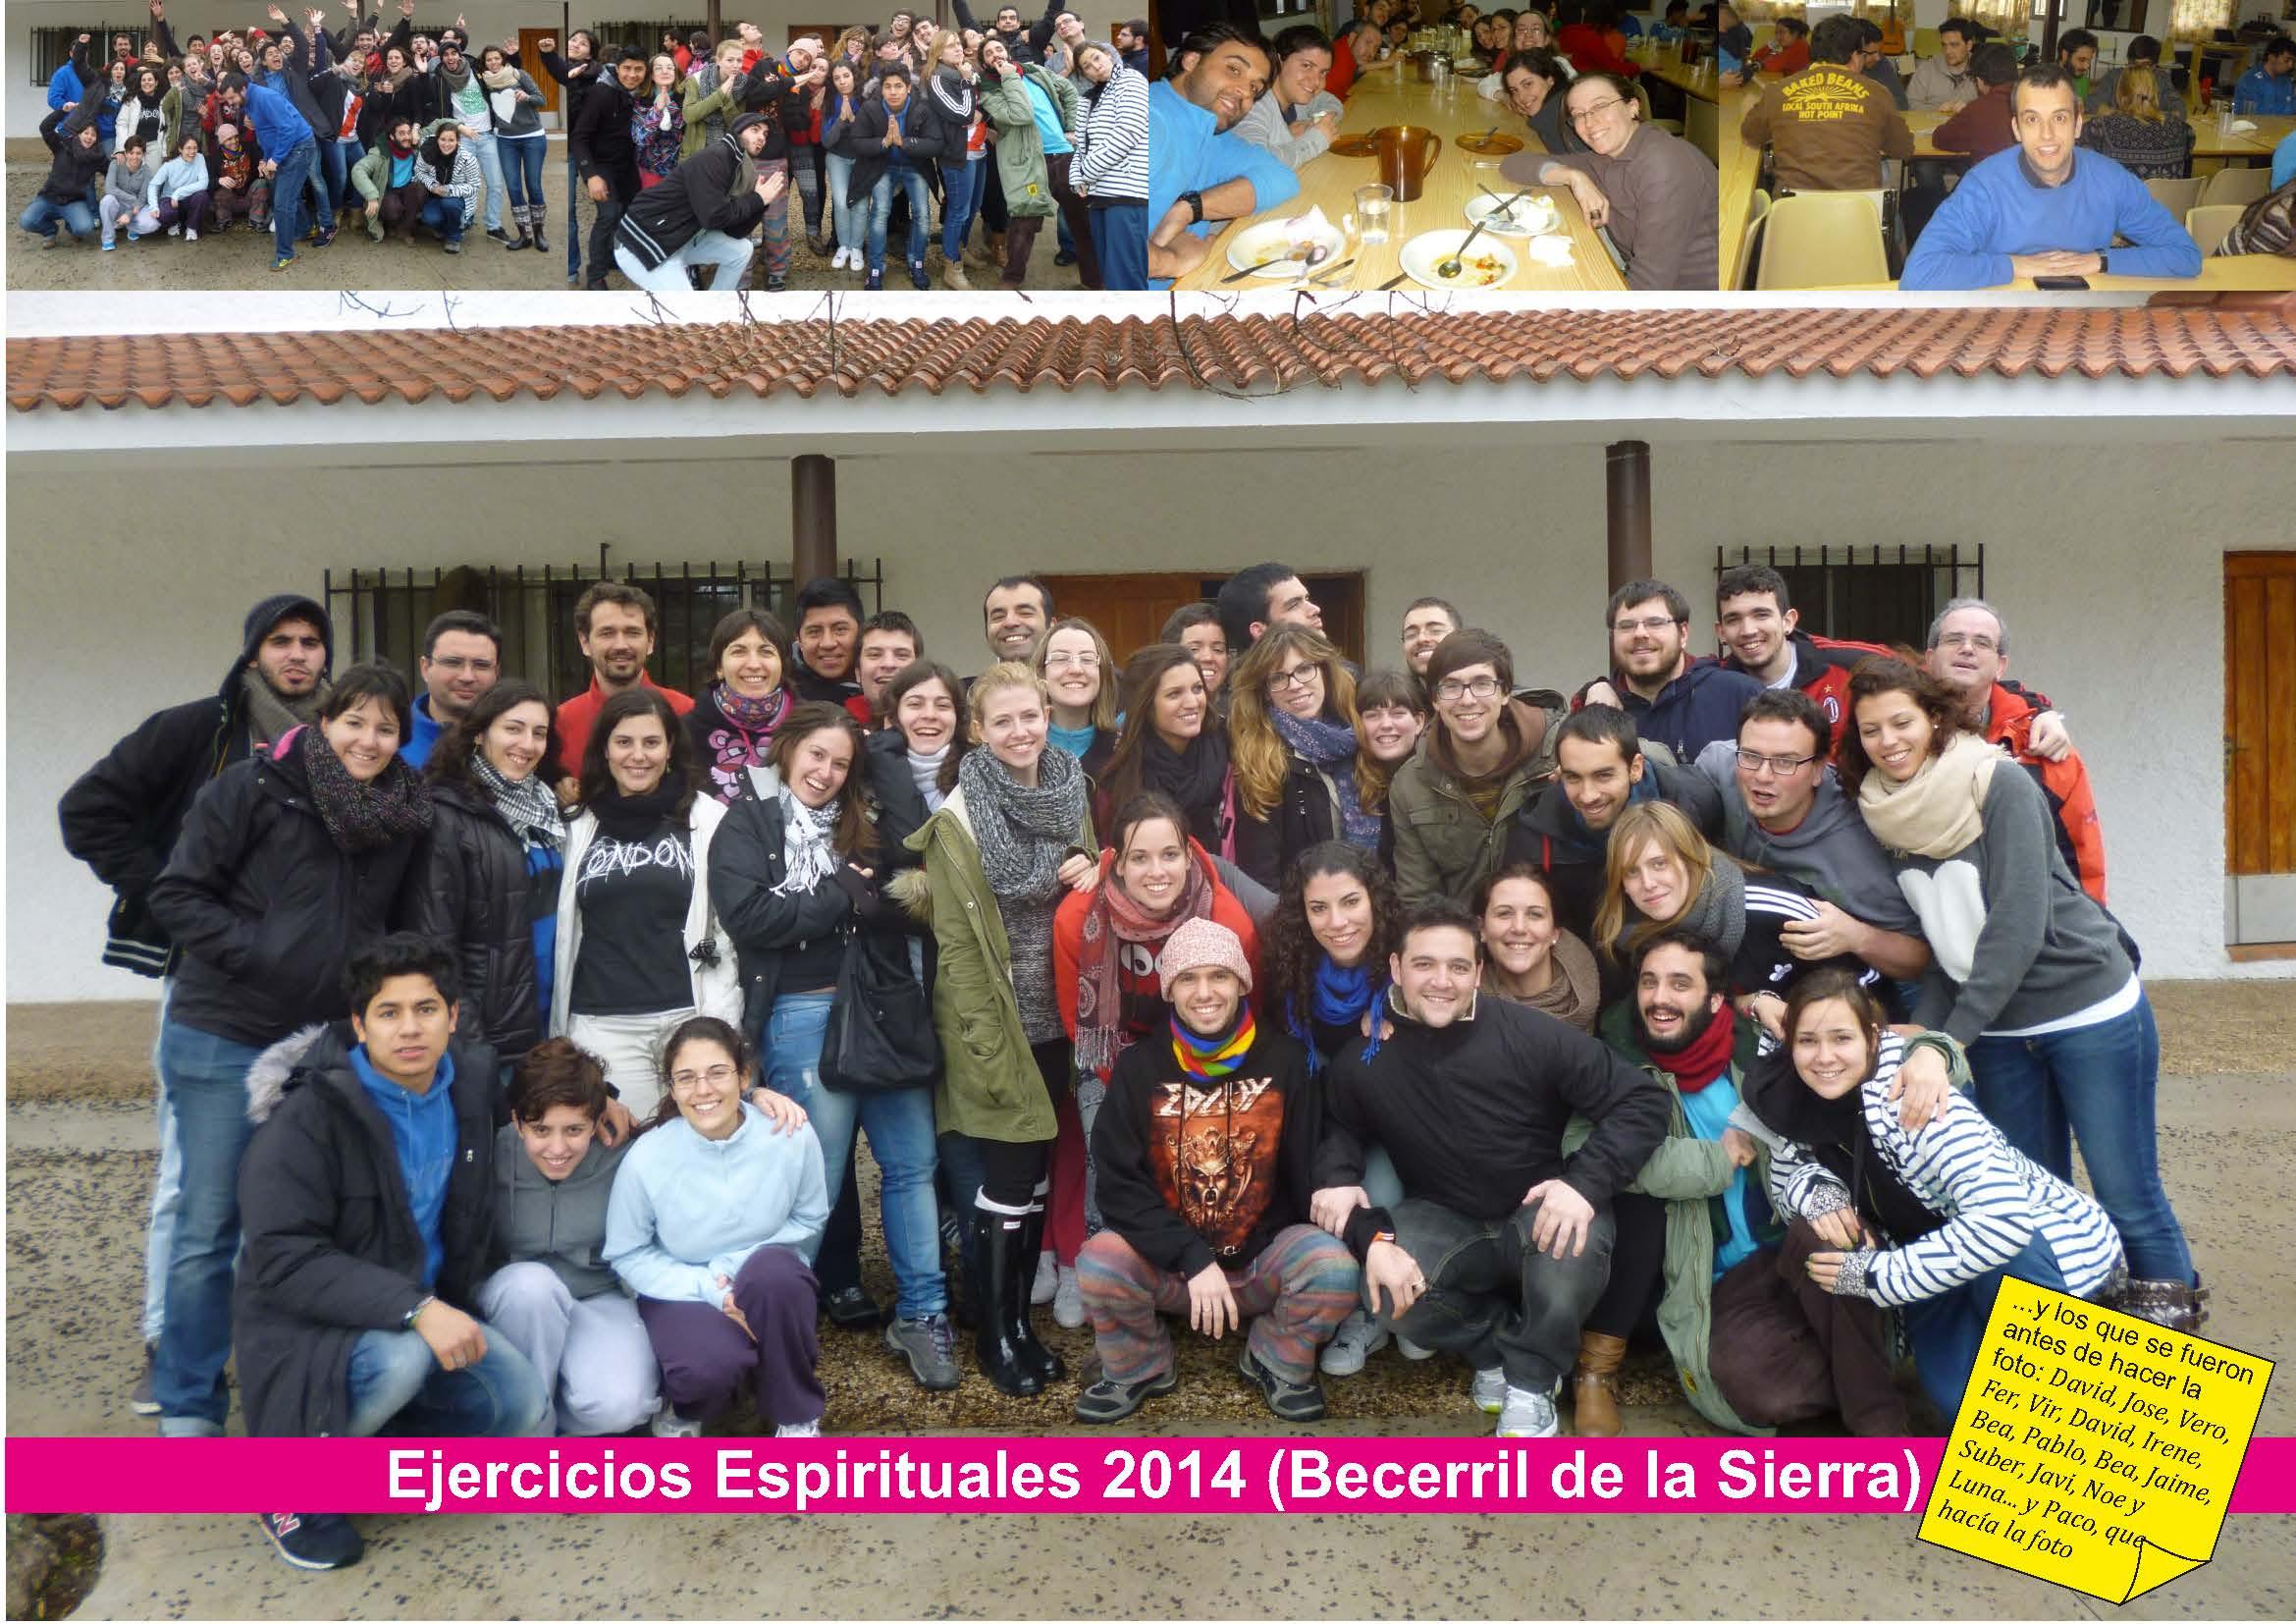 Ejercicios Espirituales 2014